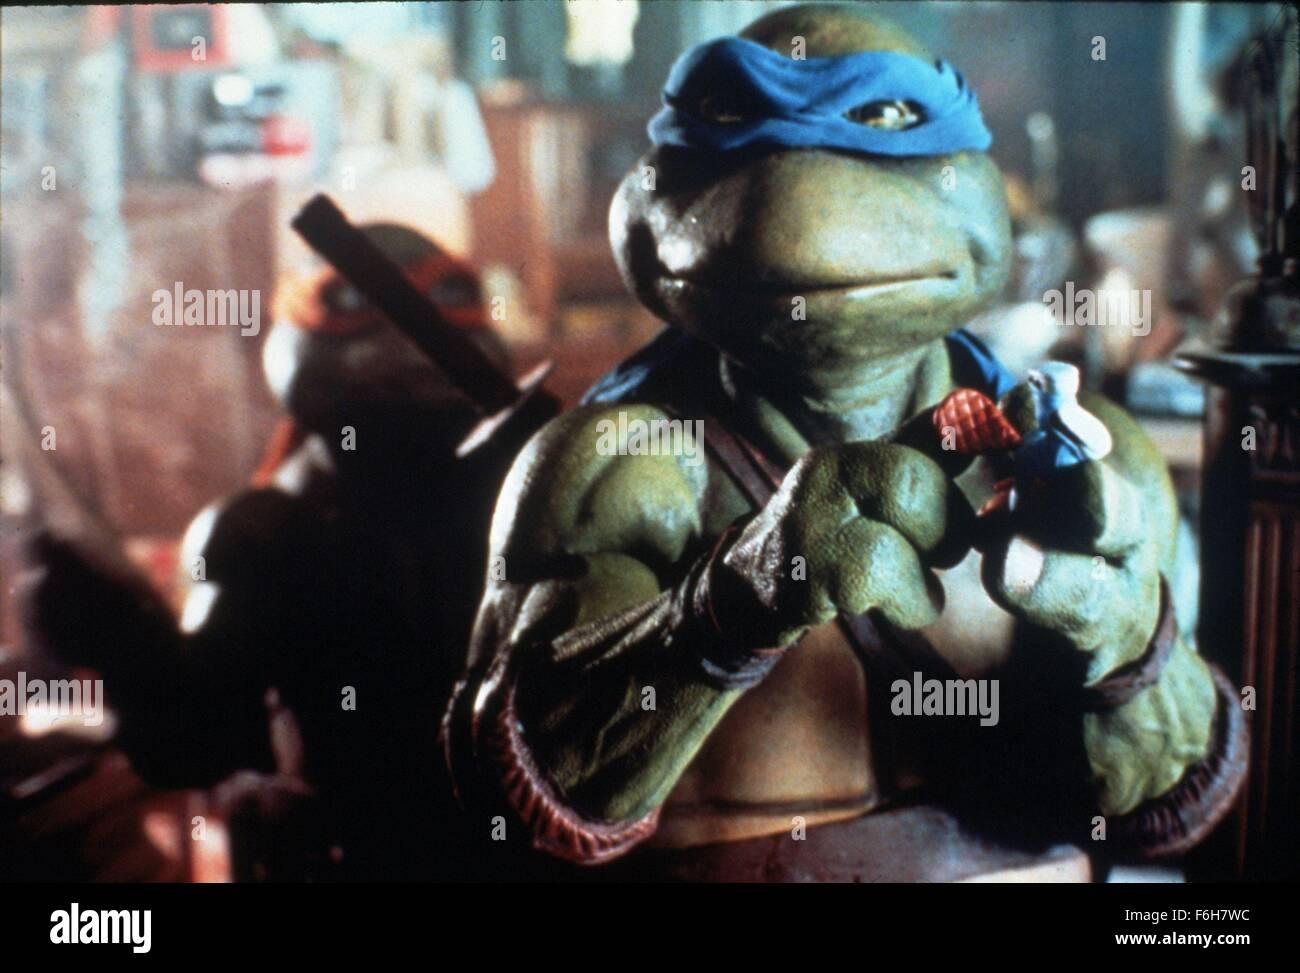 RELEASE DATE: March 30, 1990   MOVIE TITLE: Teenage Mutant Ninja Turtles   STUDIO: 888 Productions   DIRECTOR: Steve - Stock Image